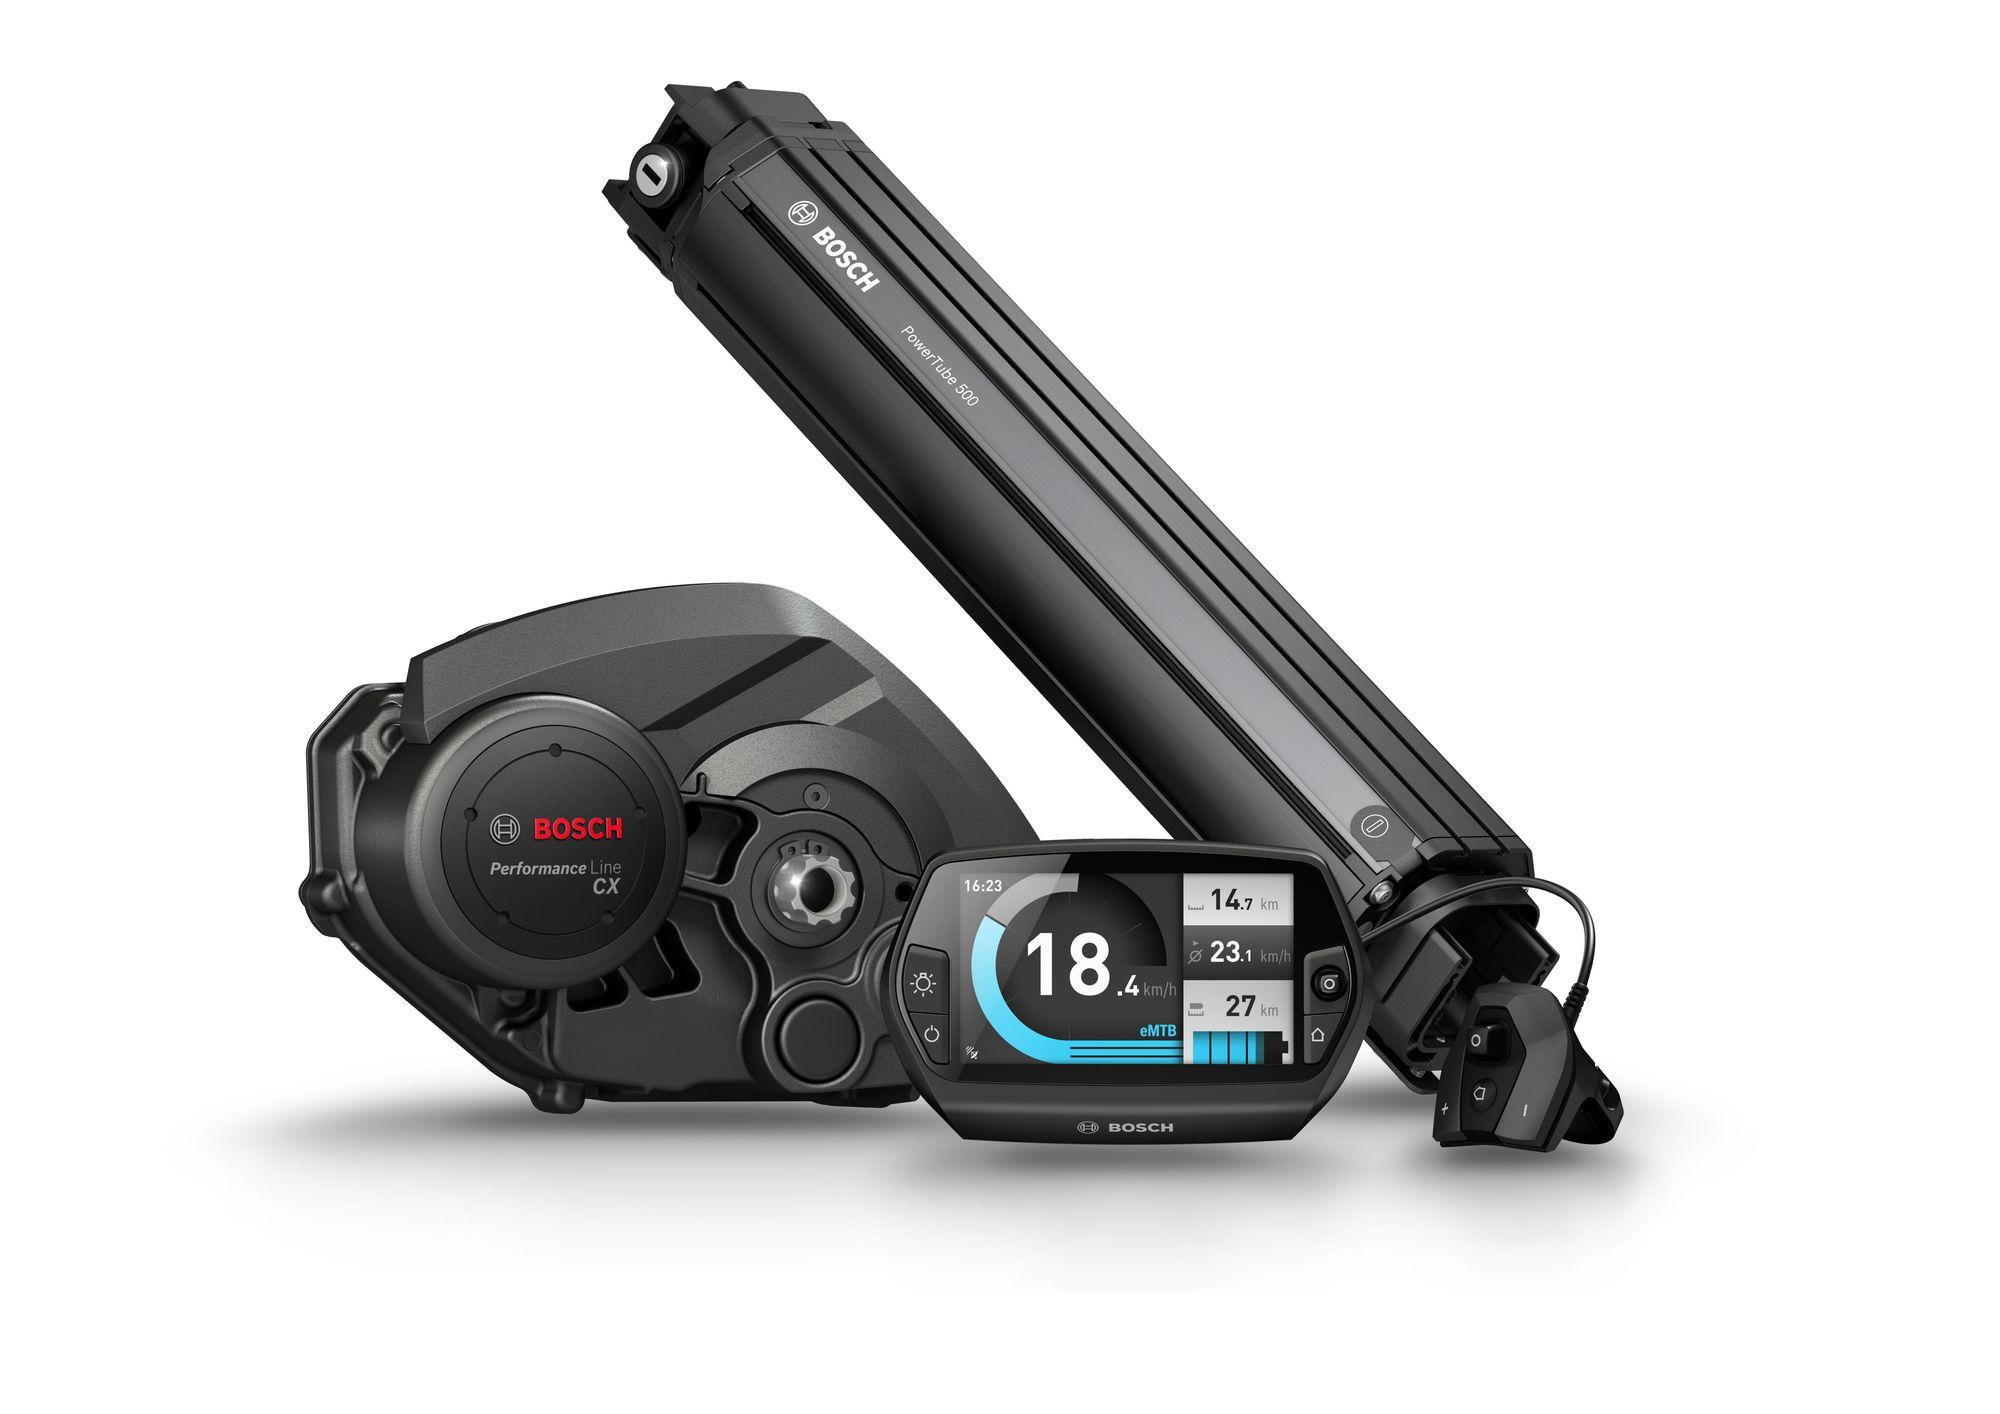 Bosch-eBike-Group-PerformanceLine-CX-PowerTube500-Horizontal-Nyon-Ride-eMTB-Mode-MY2018-white_EN